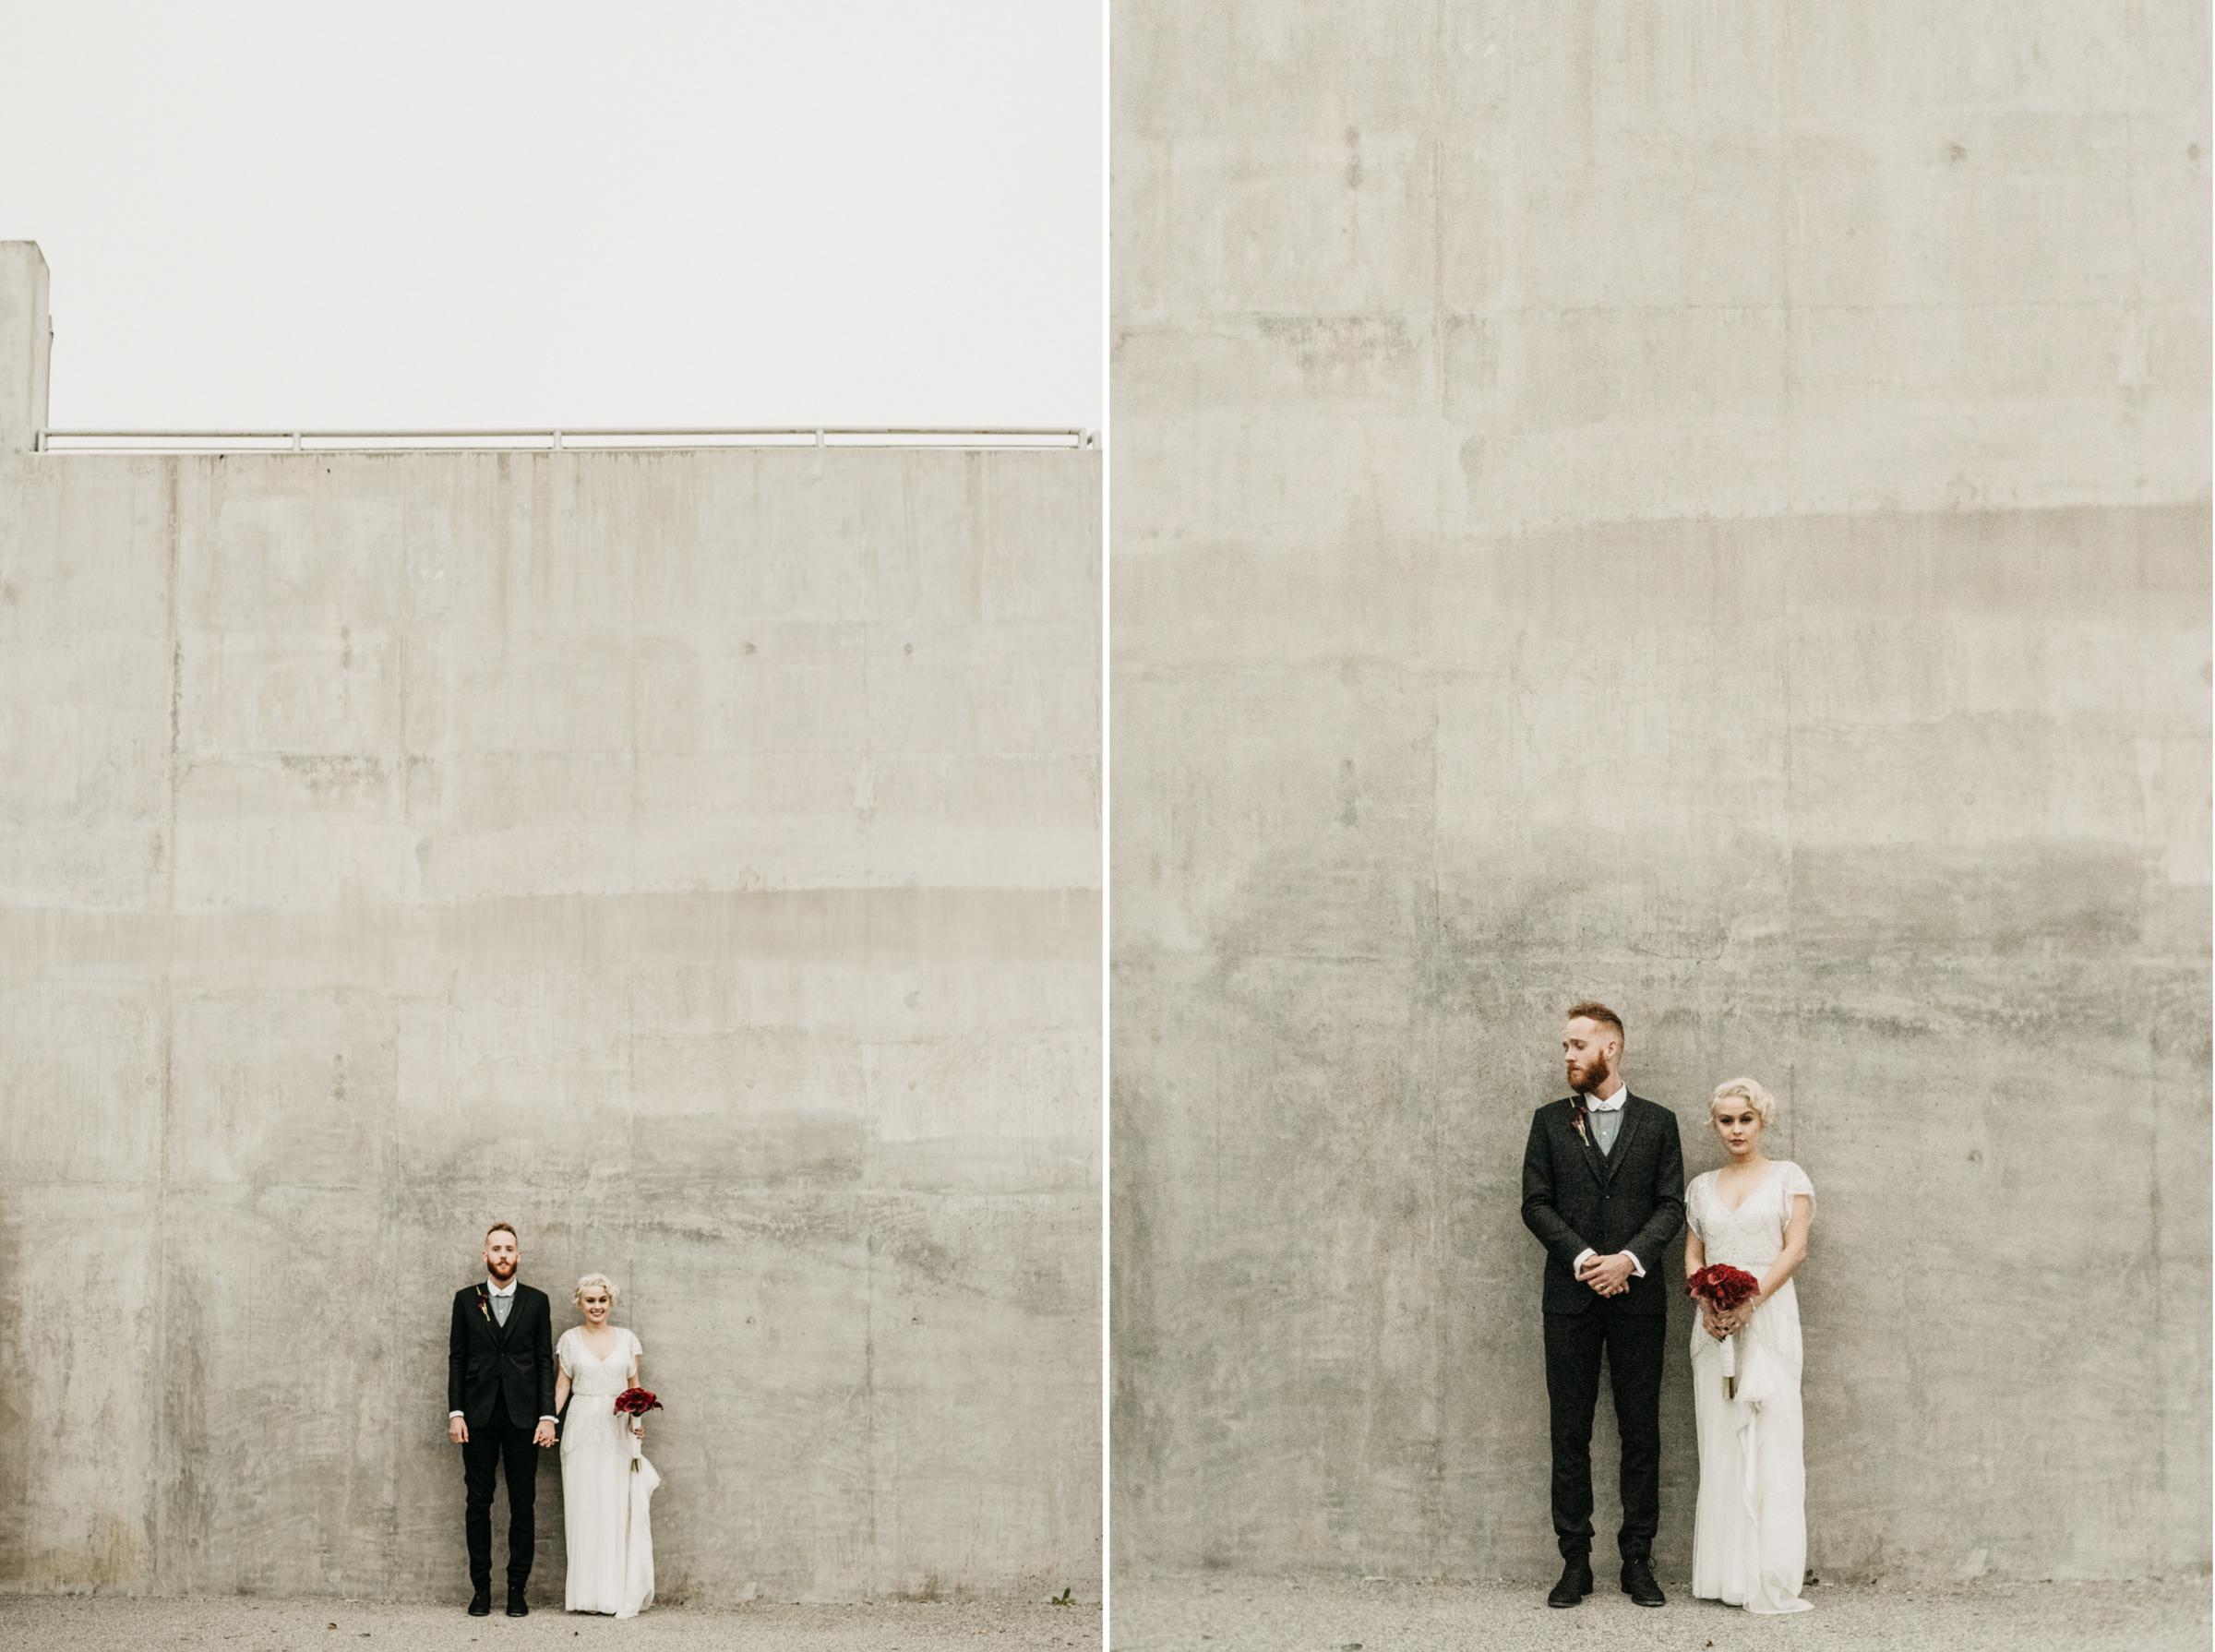 ©Isaiah + Taylor Photography - Studio 11 Wedding, Los Angeles Wedding Photographer-131.jpg